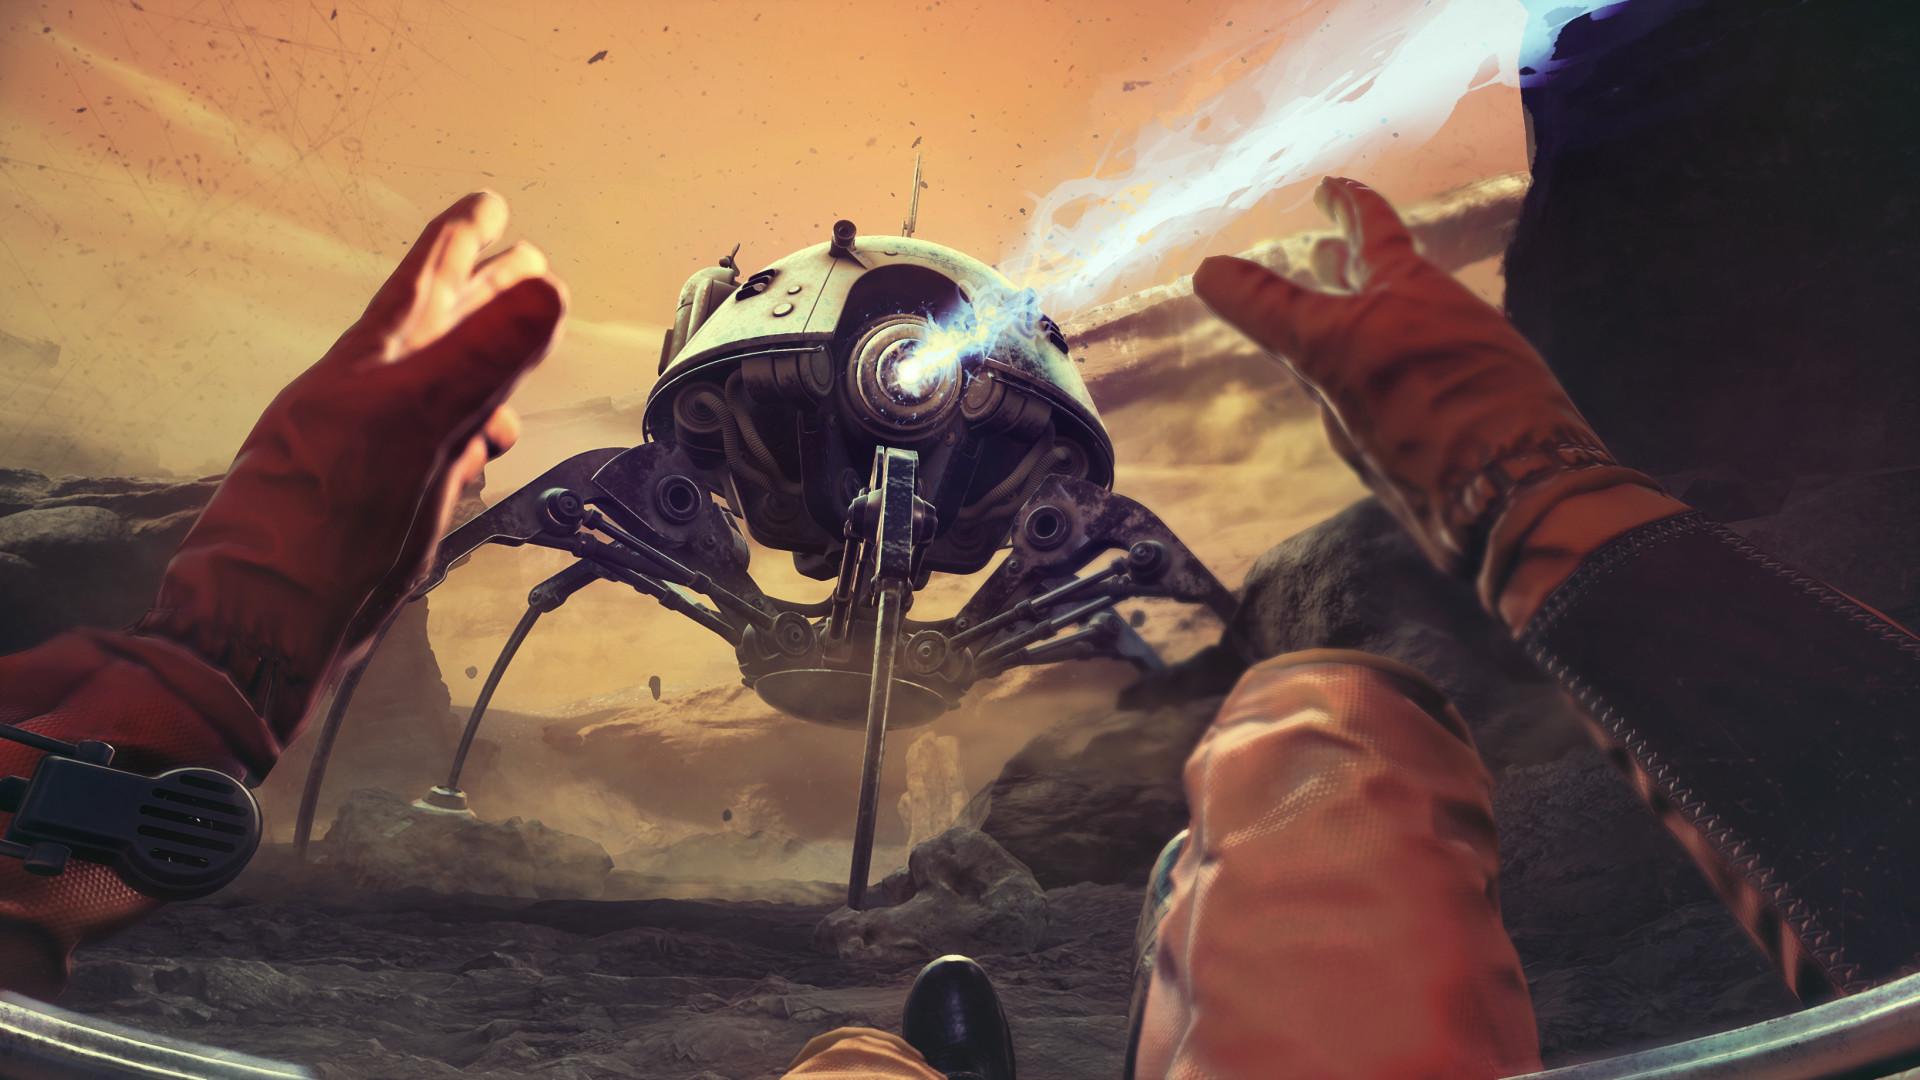 The Invincible Sci-Fi Thriller